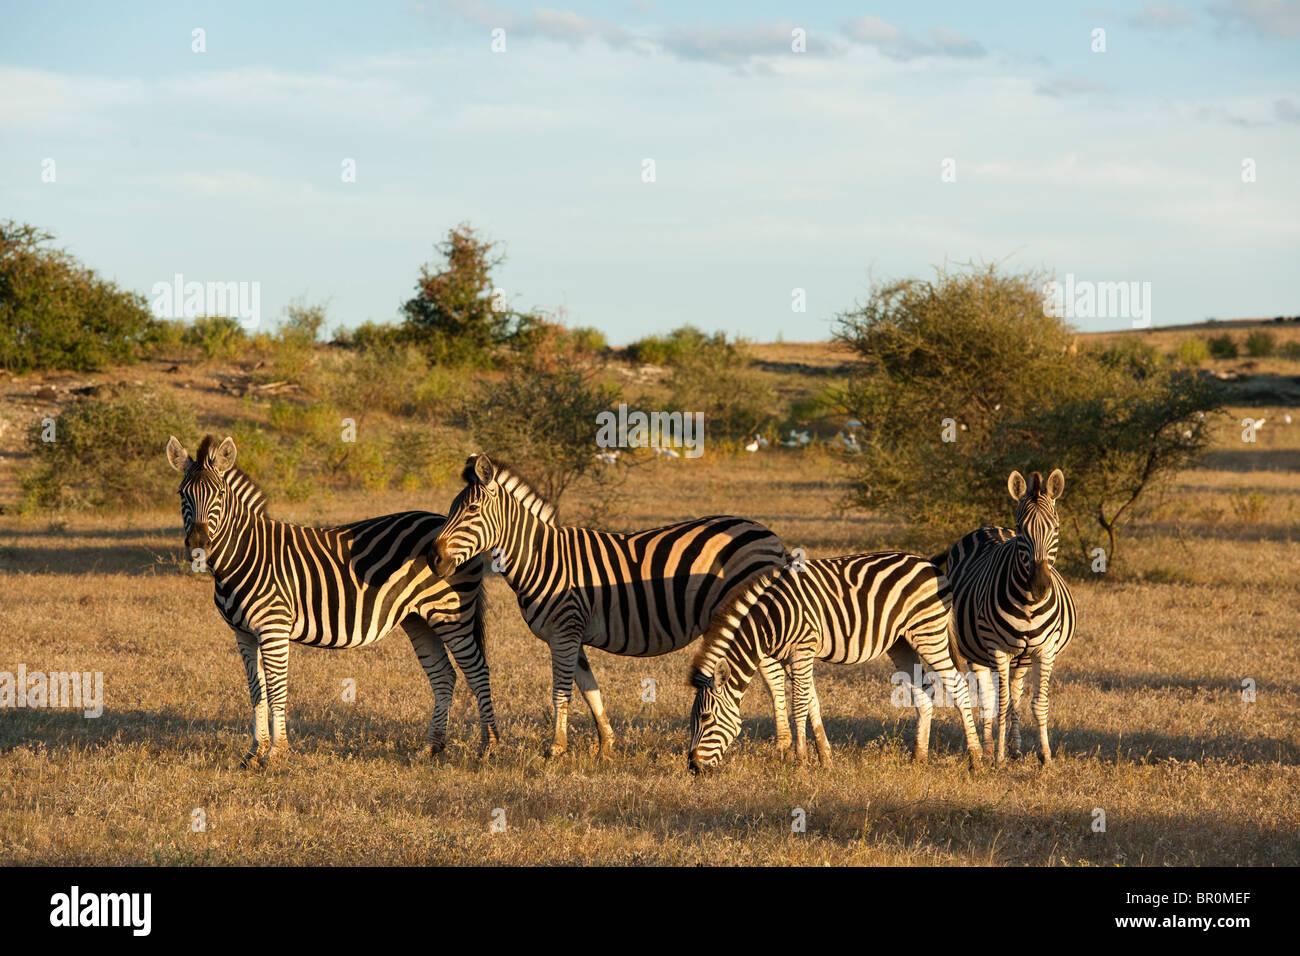 Burchell's zebra (Equus burchellii), Mashatu Game Reserve, tuli block, Botswana - Stock Image